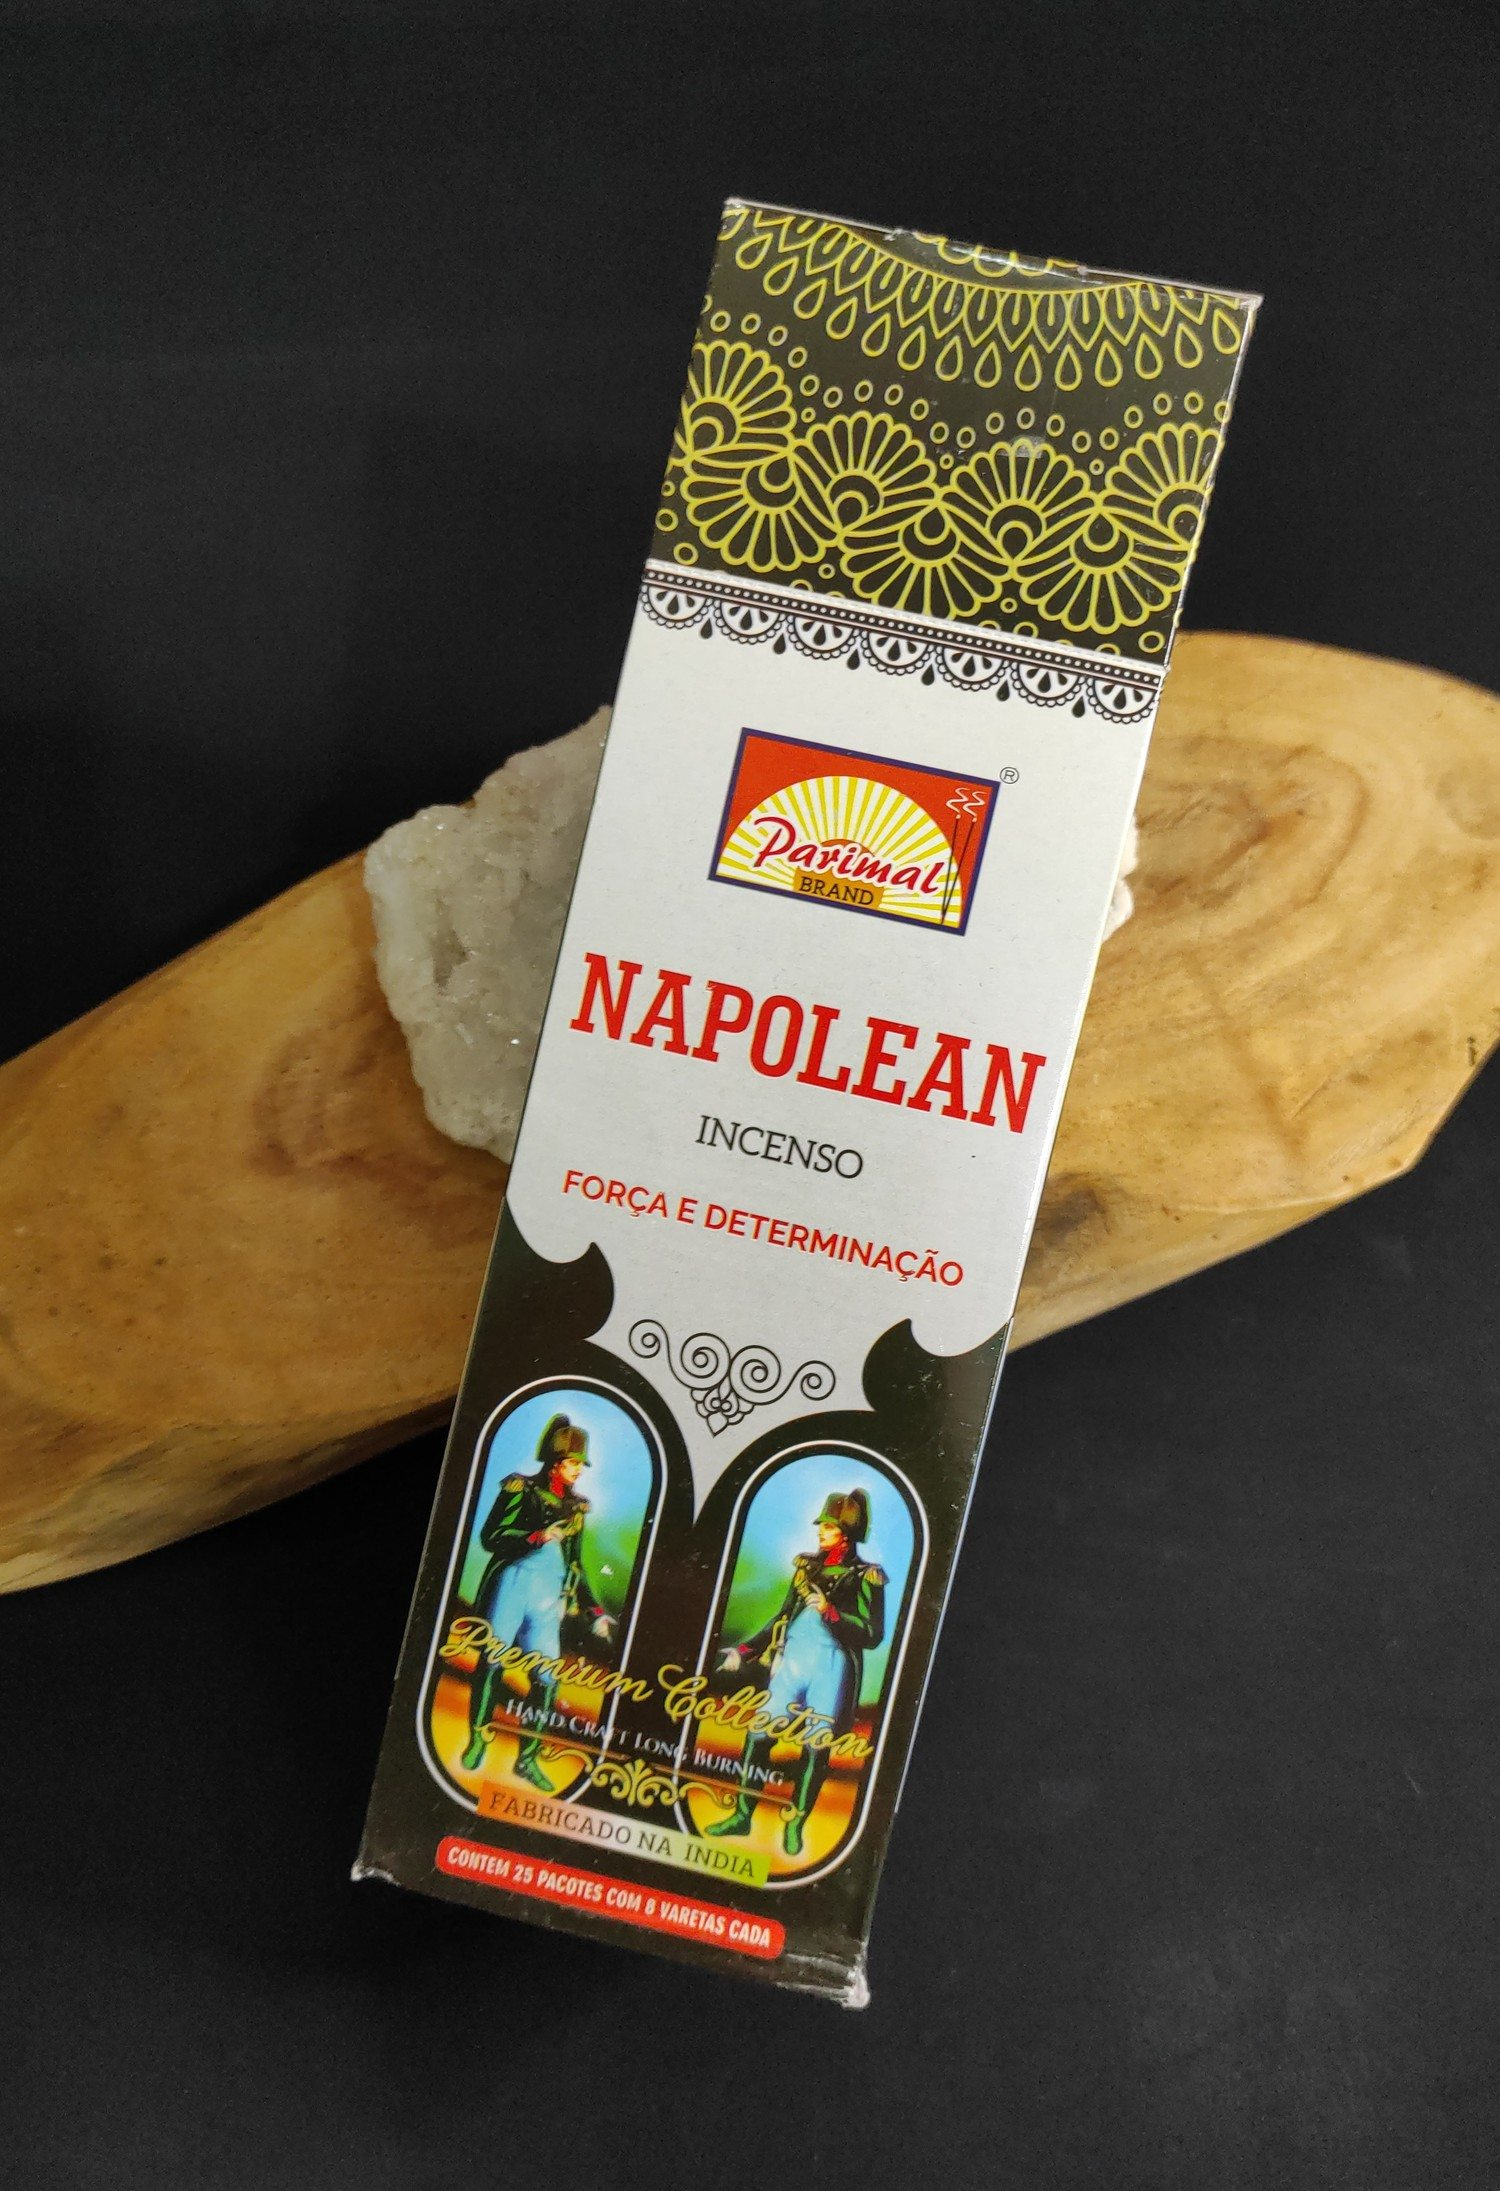 Incenso Napolean Incenso Indiano Parimal Napolean